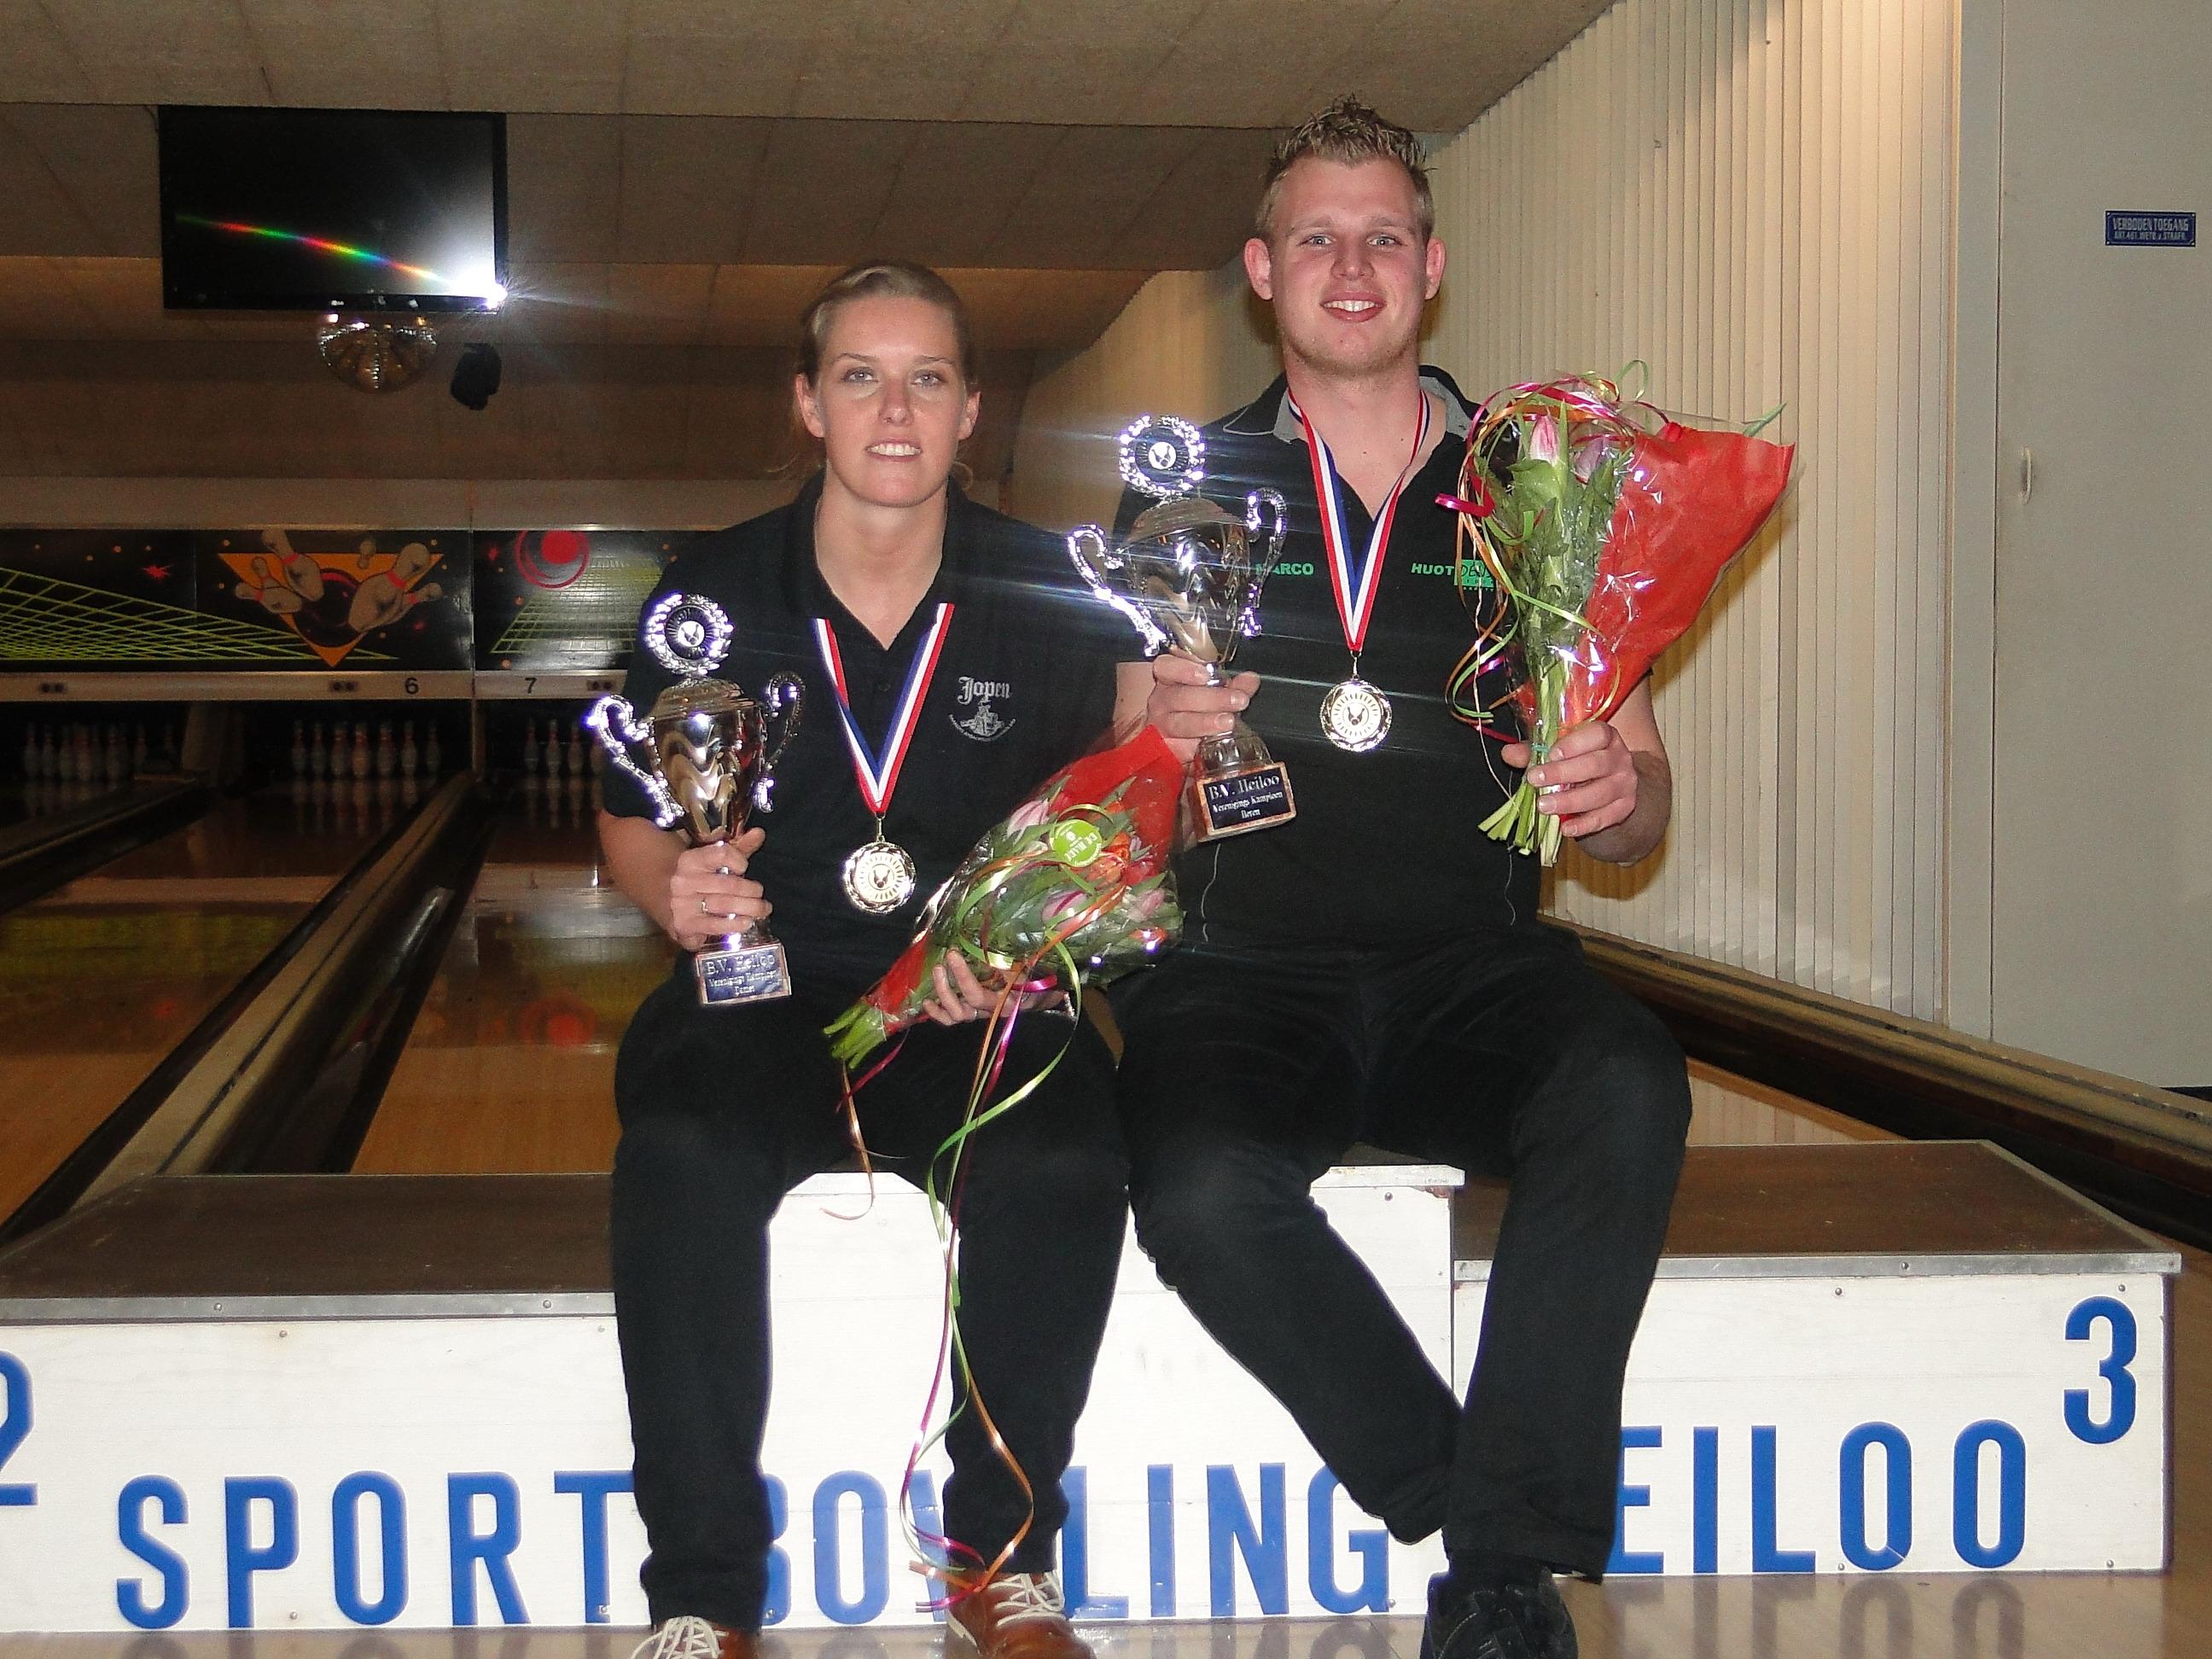 http://www.bowlingverenigingheiloo.nl/fotos_verhalen/foto's/2013_0214-Ver.kampioenen-2013.jpg